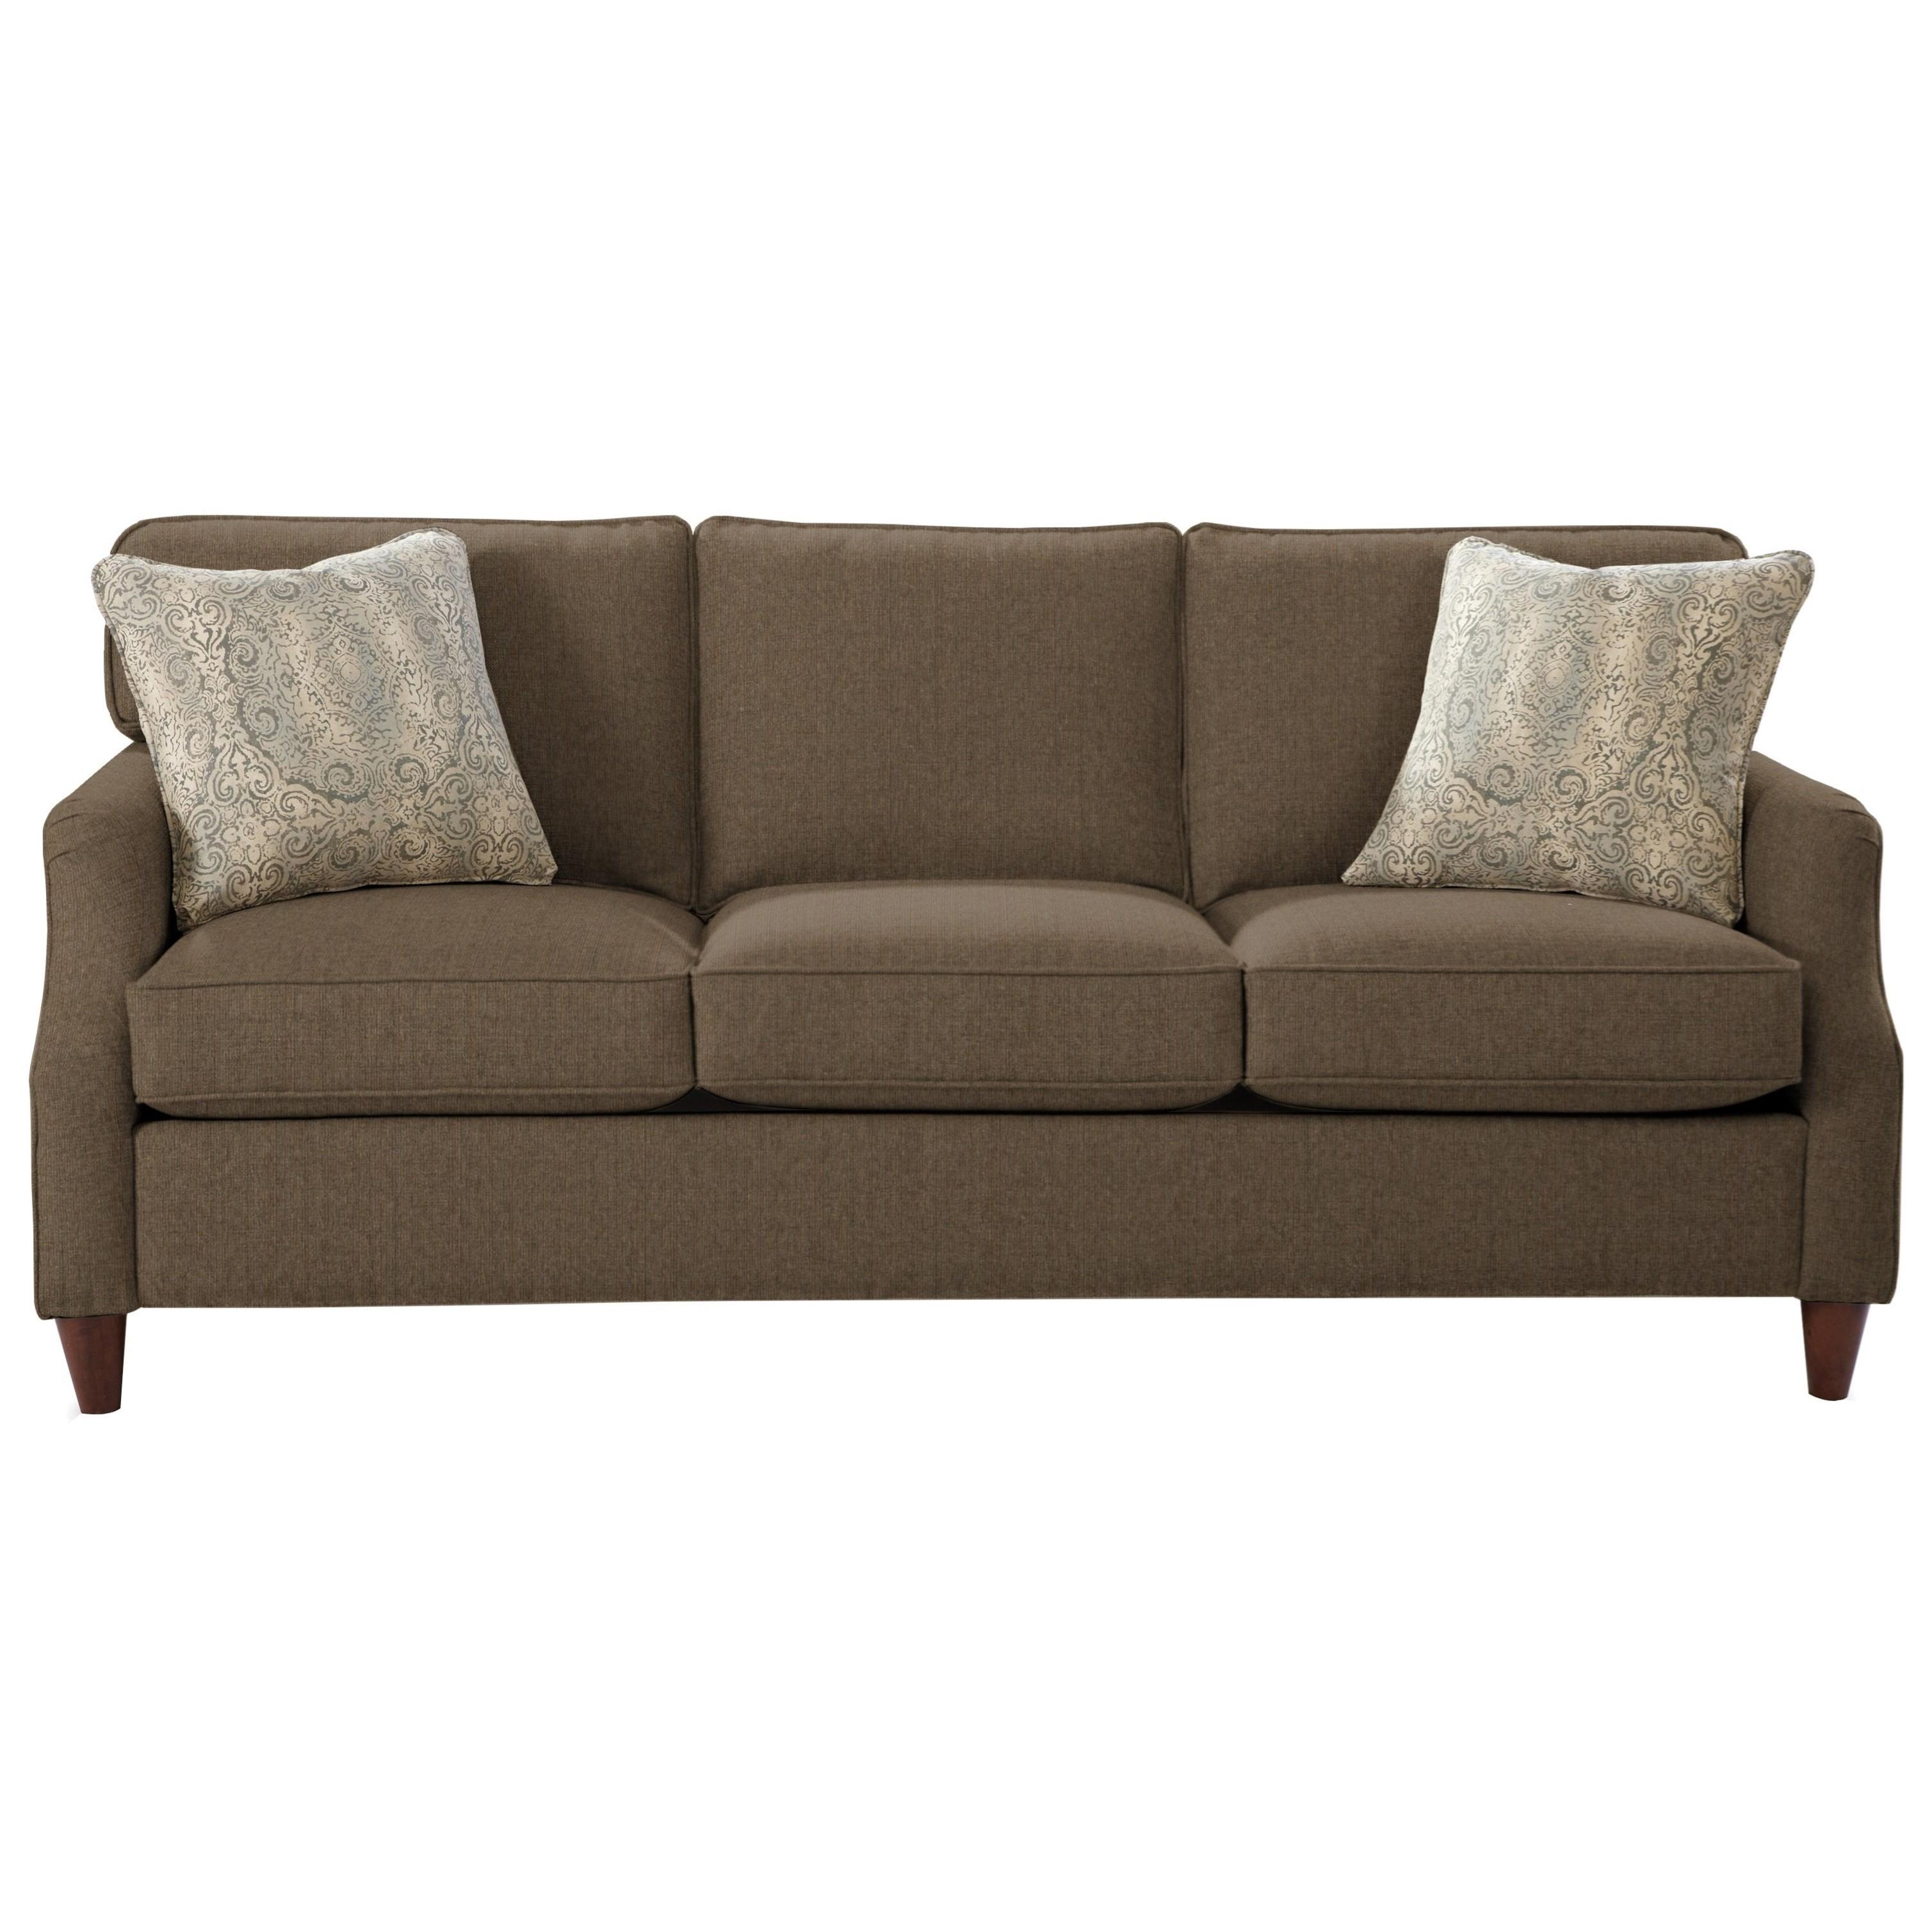 Craftmaster 7364 Sofa - Item Number: 736450-LOADED-09